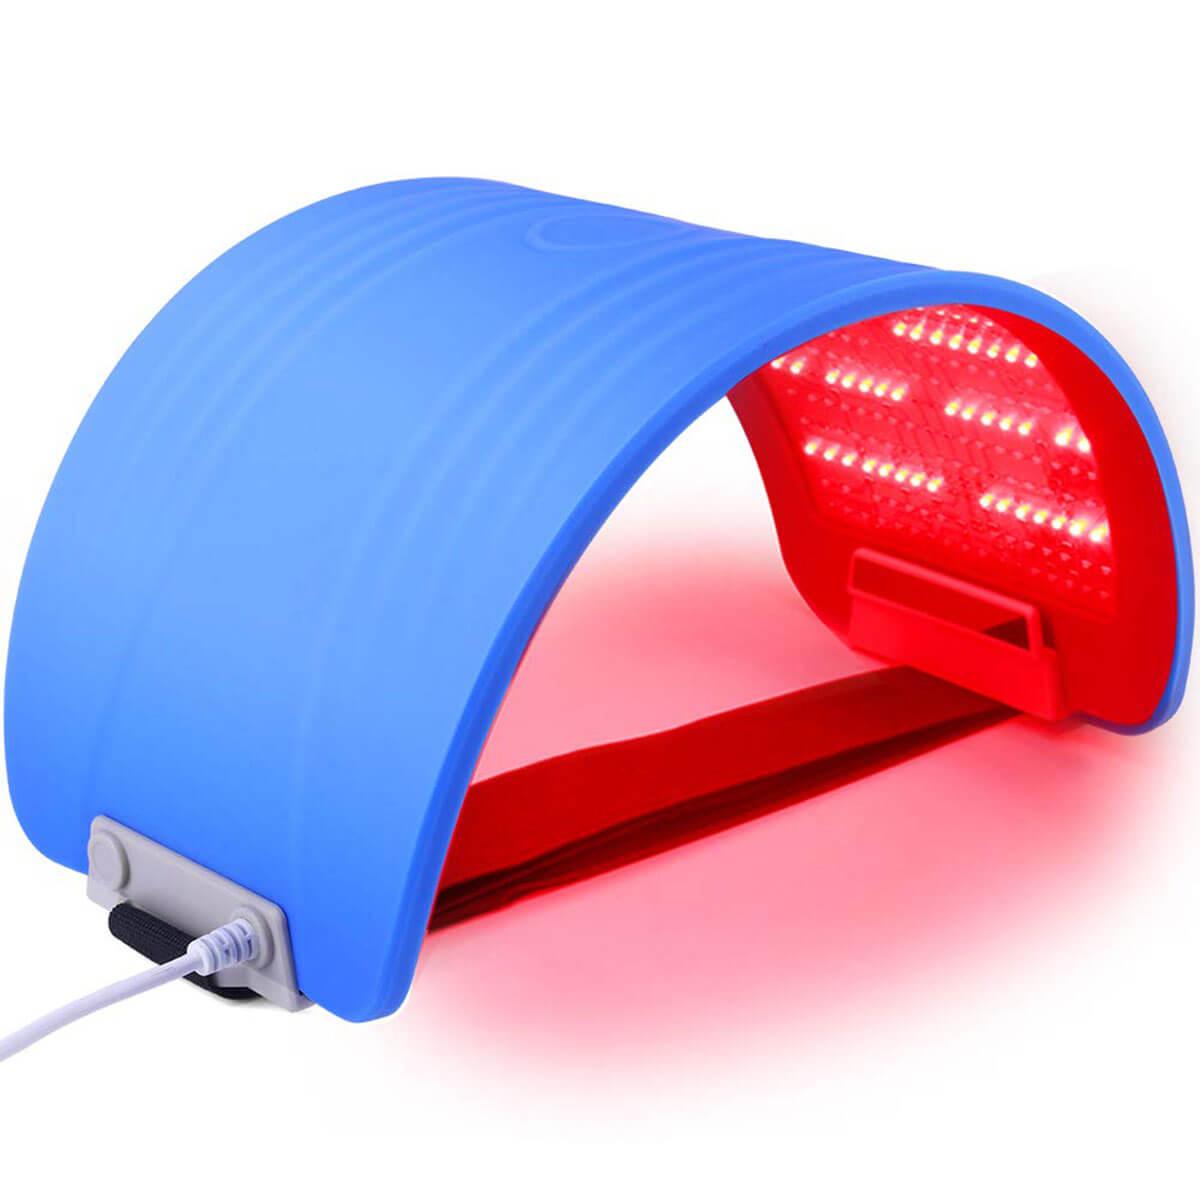 7 color LED light device 11